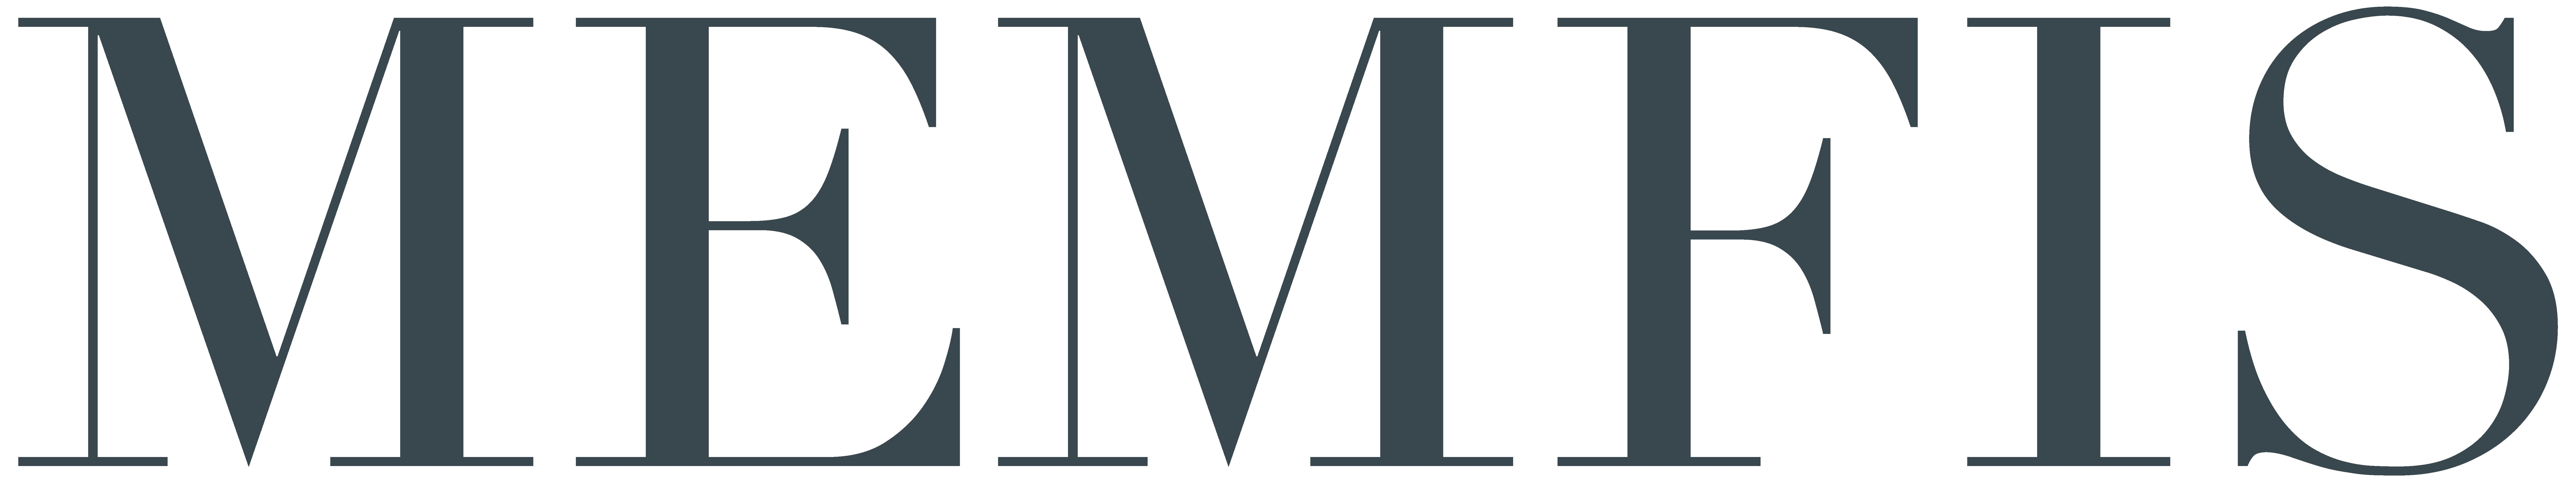 Silva High Resolution Logo